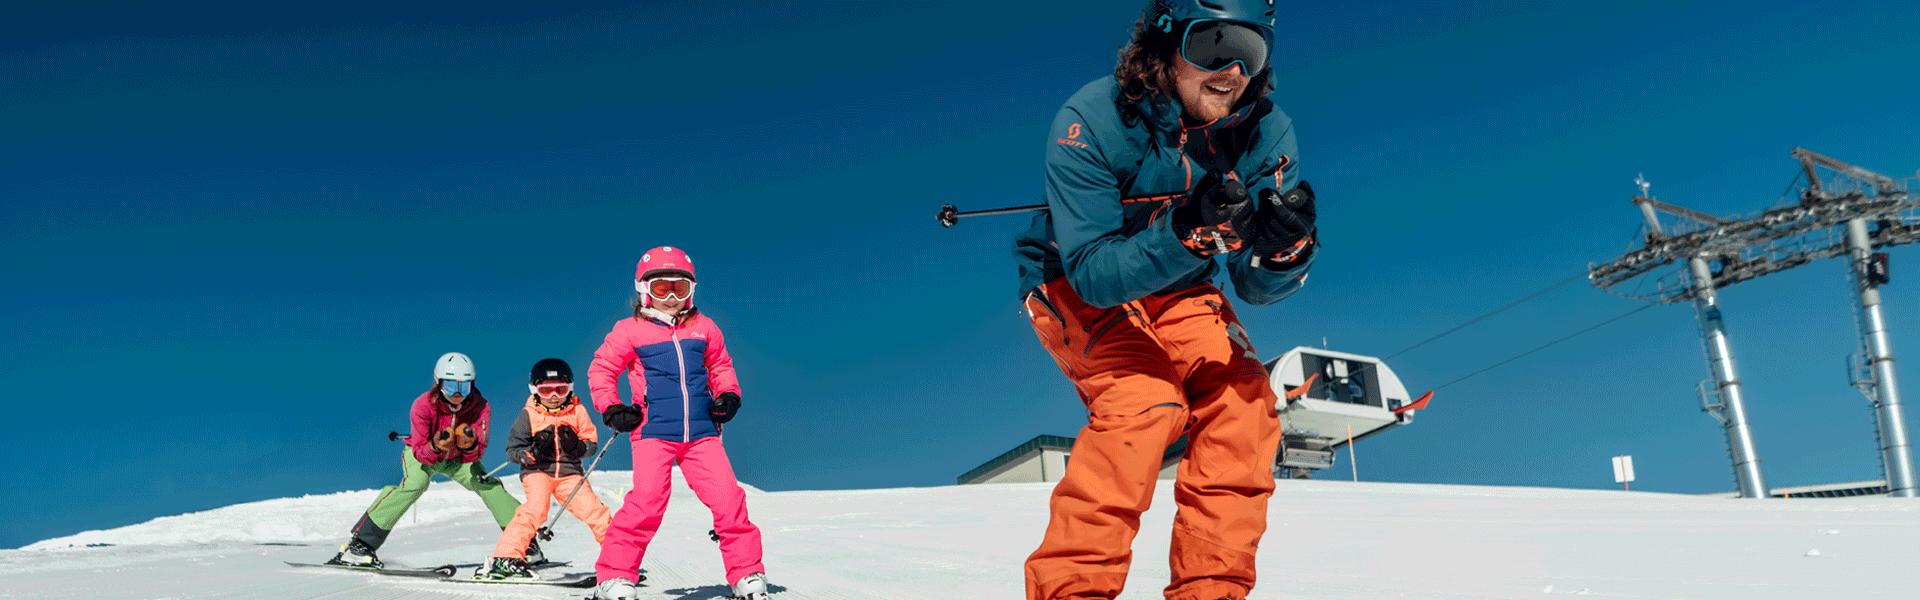 gailberg.at - Kids Ski For Free